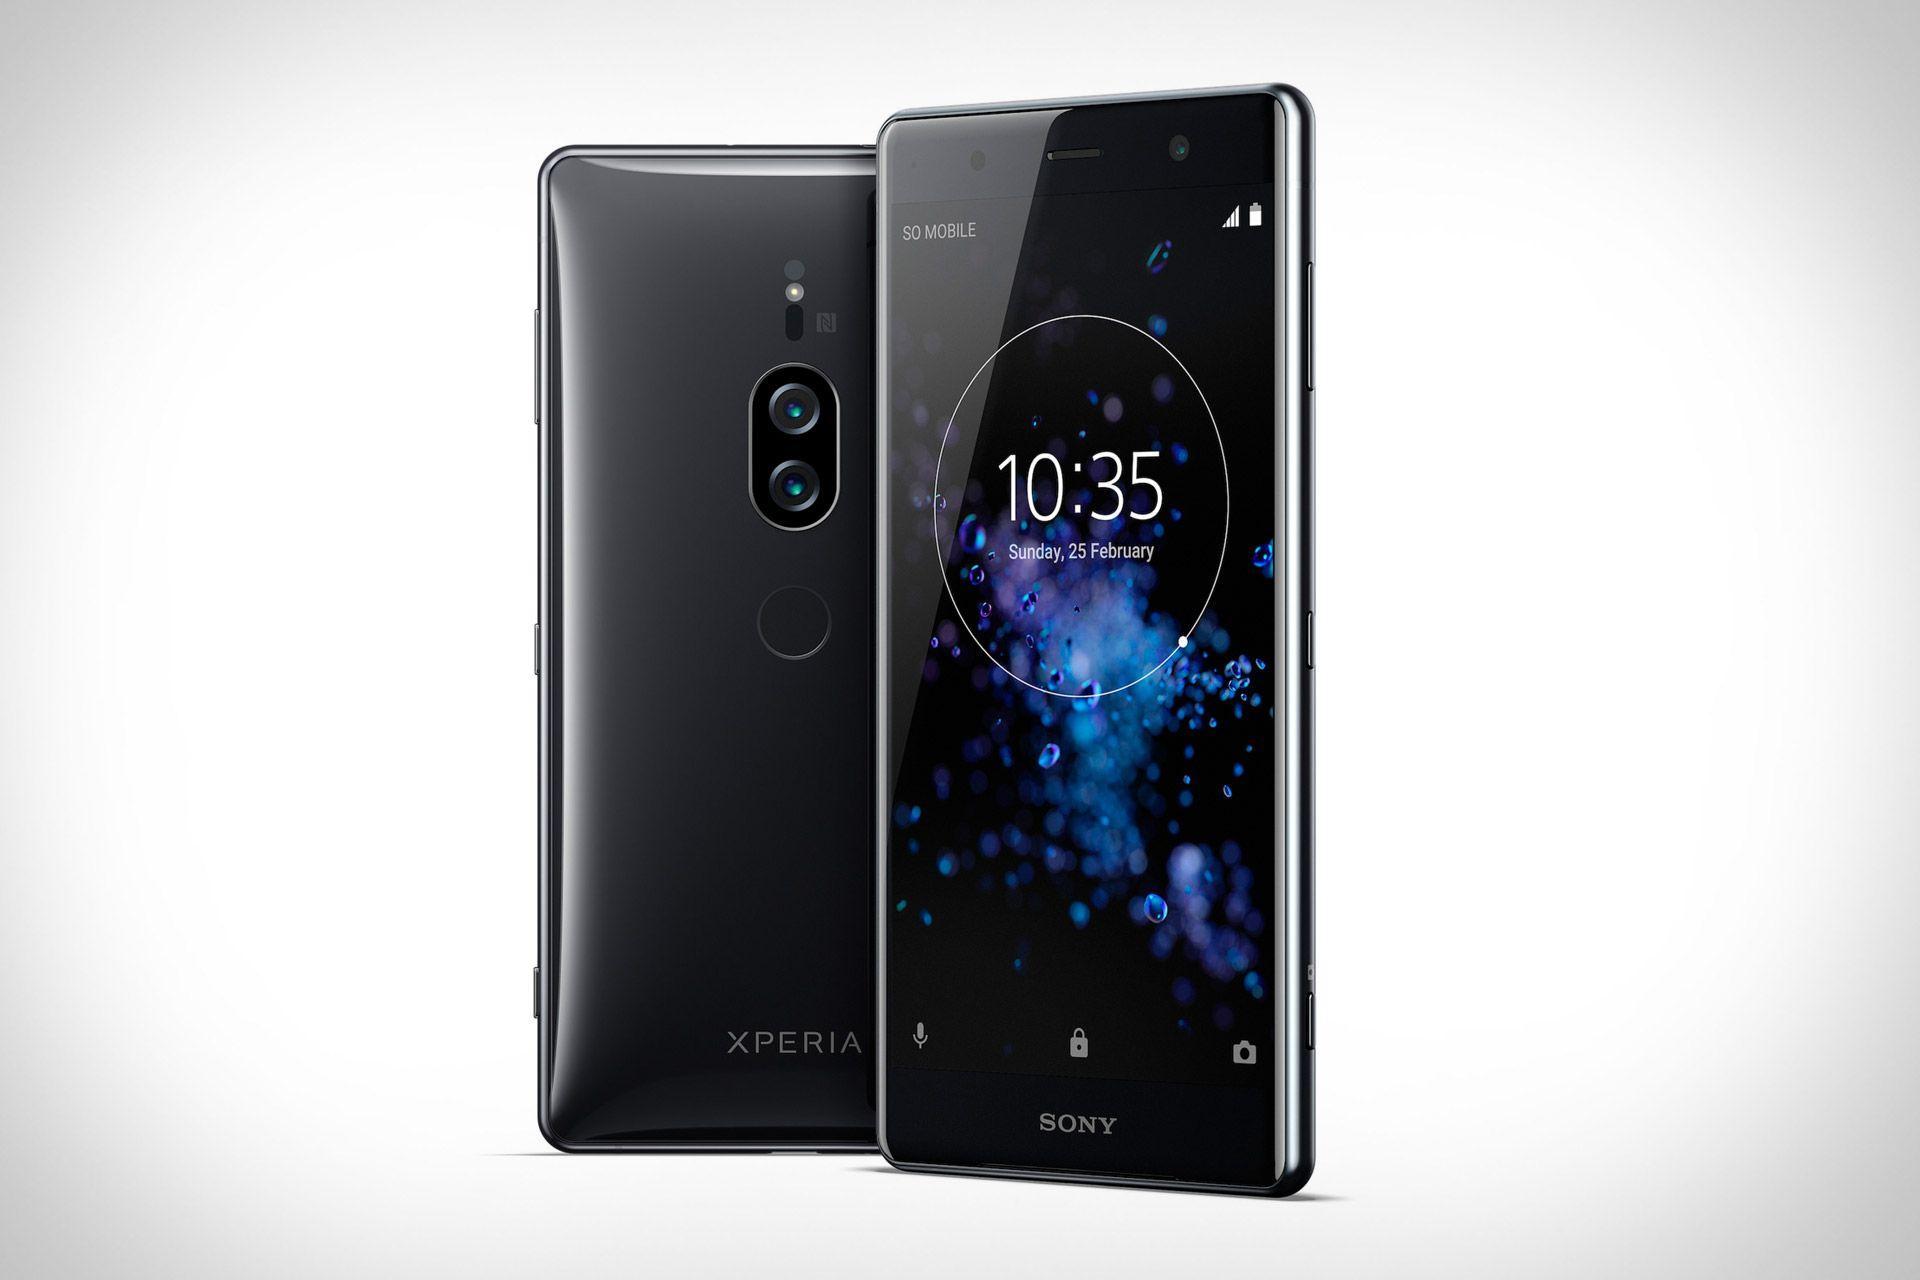 Sony Xperia Xz2 Premium Smartphone Premium Smartphone Smartphone Sony Xperia